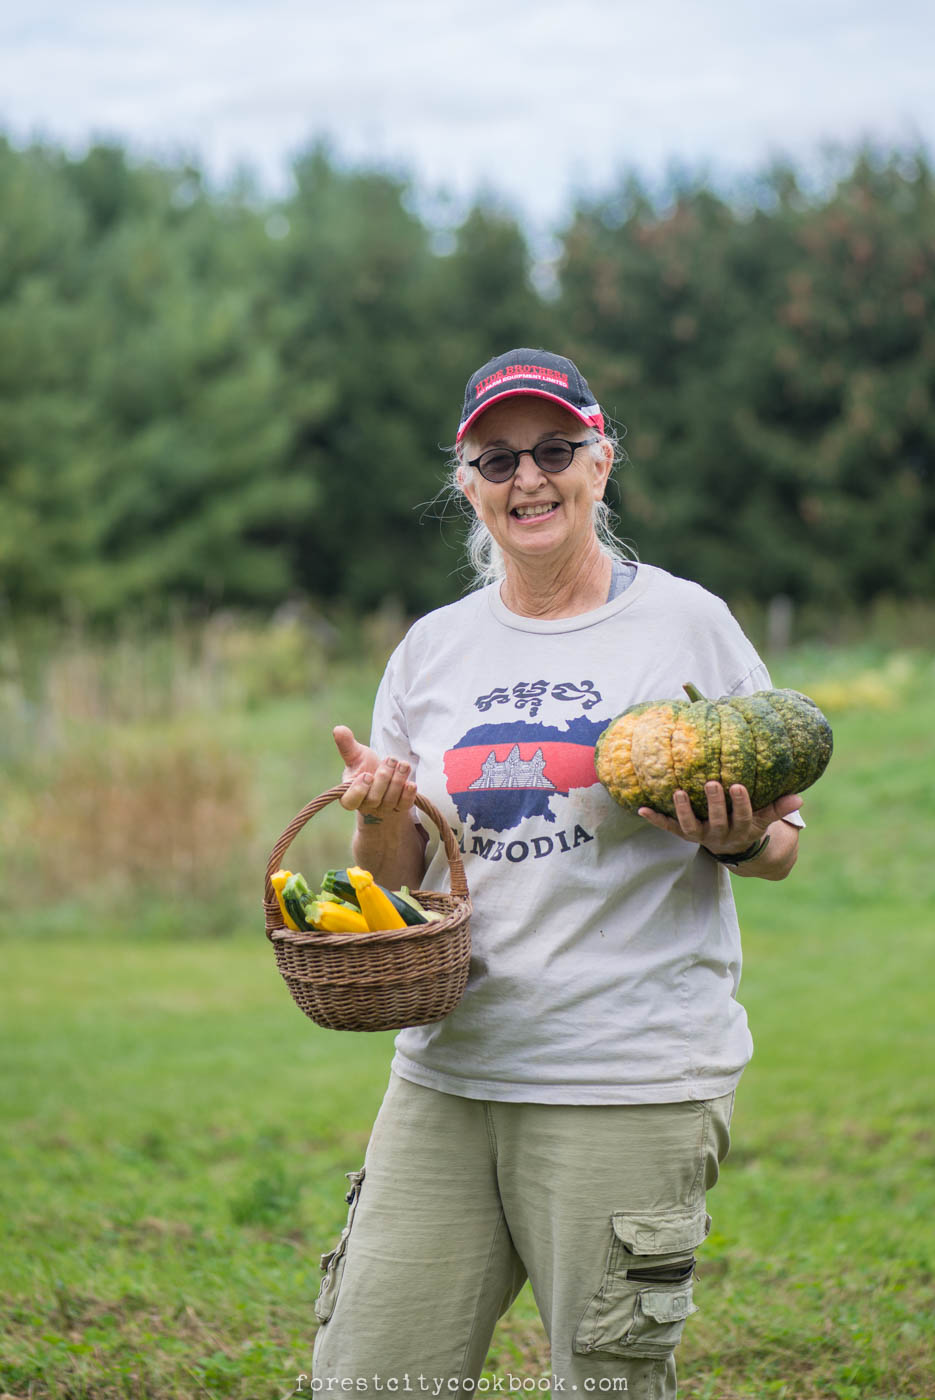 Forest City Cookbook - Kawthoolei Farms